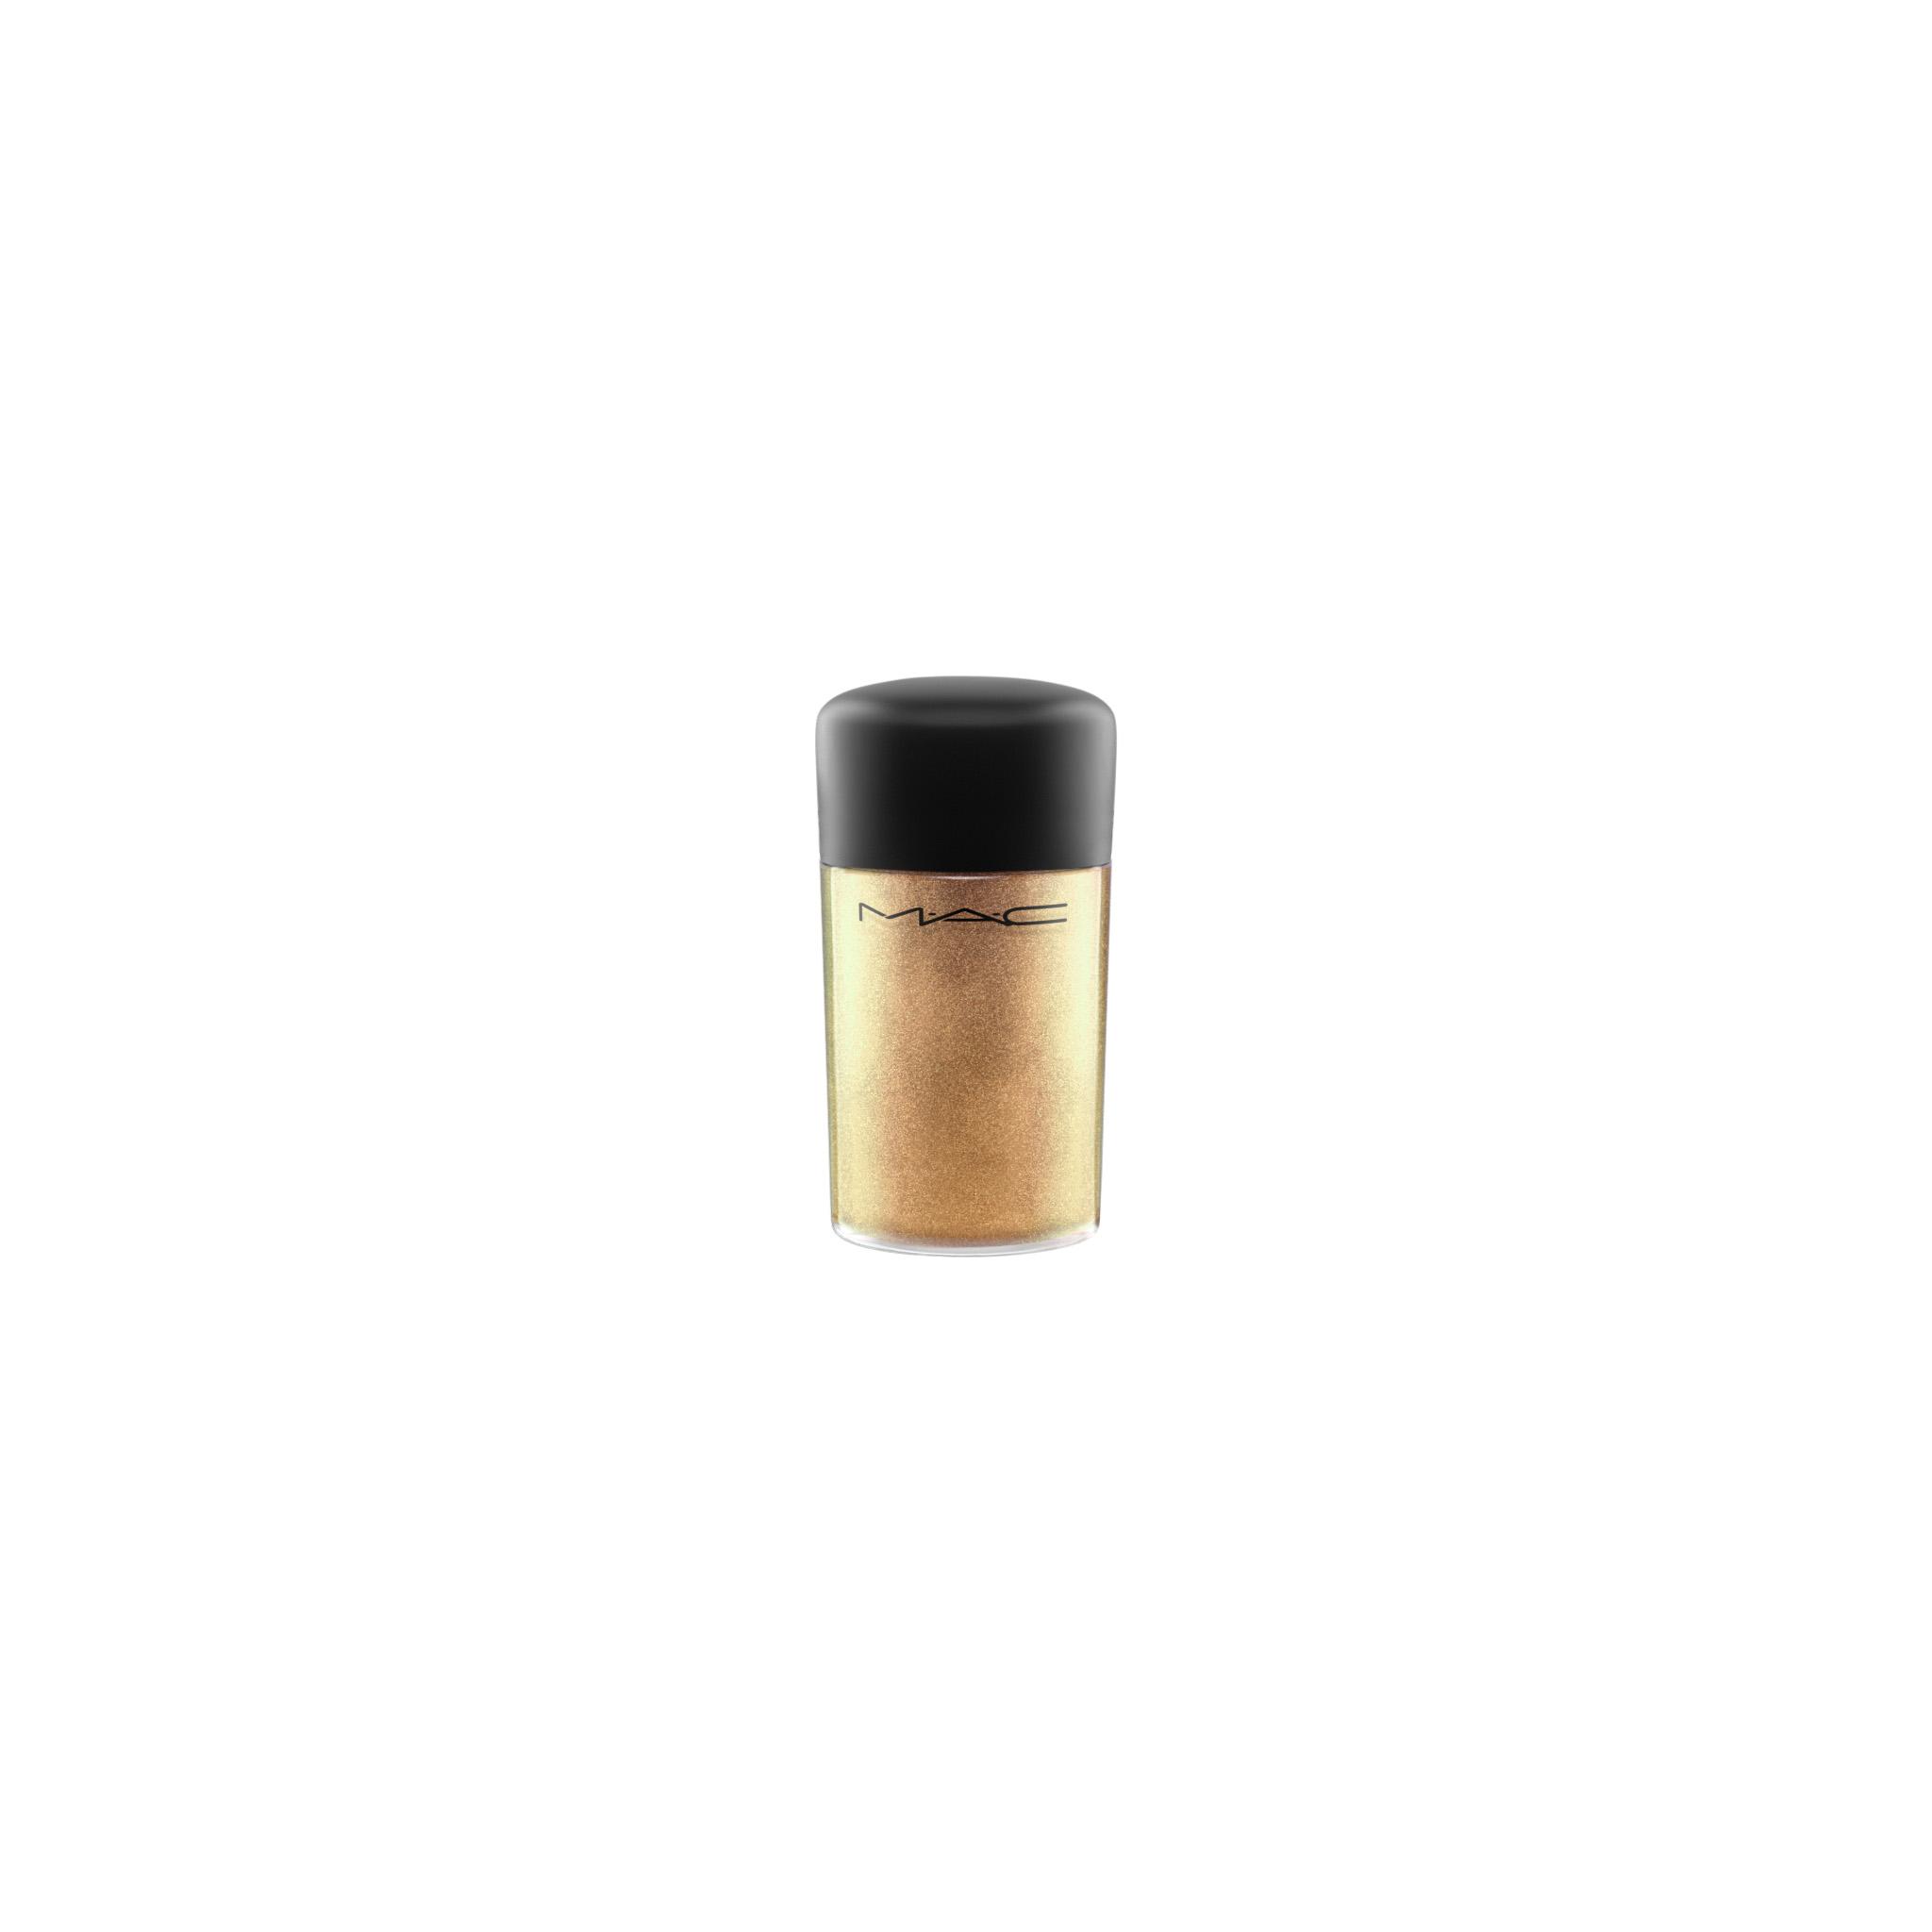 Pigment / Nutcracker Old  Gold